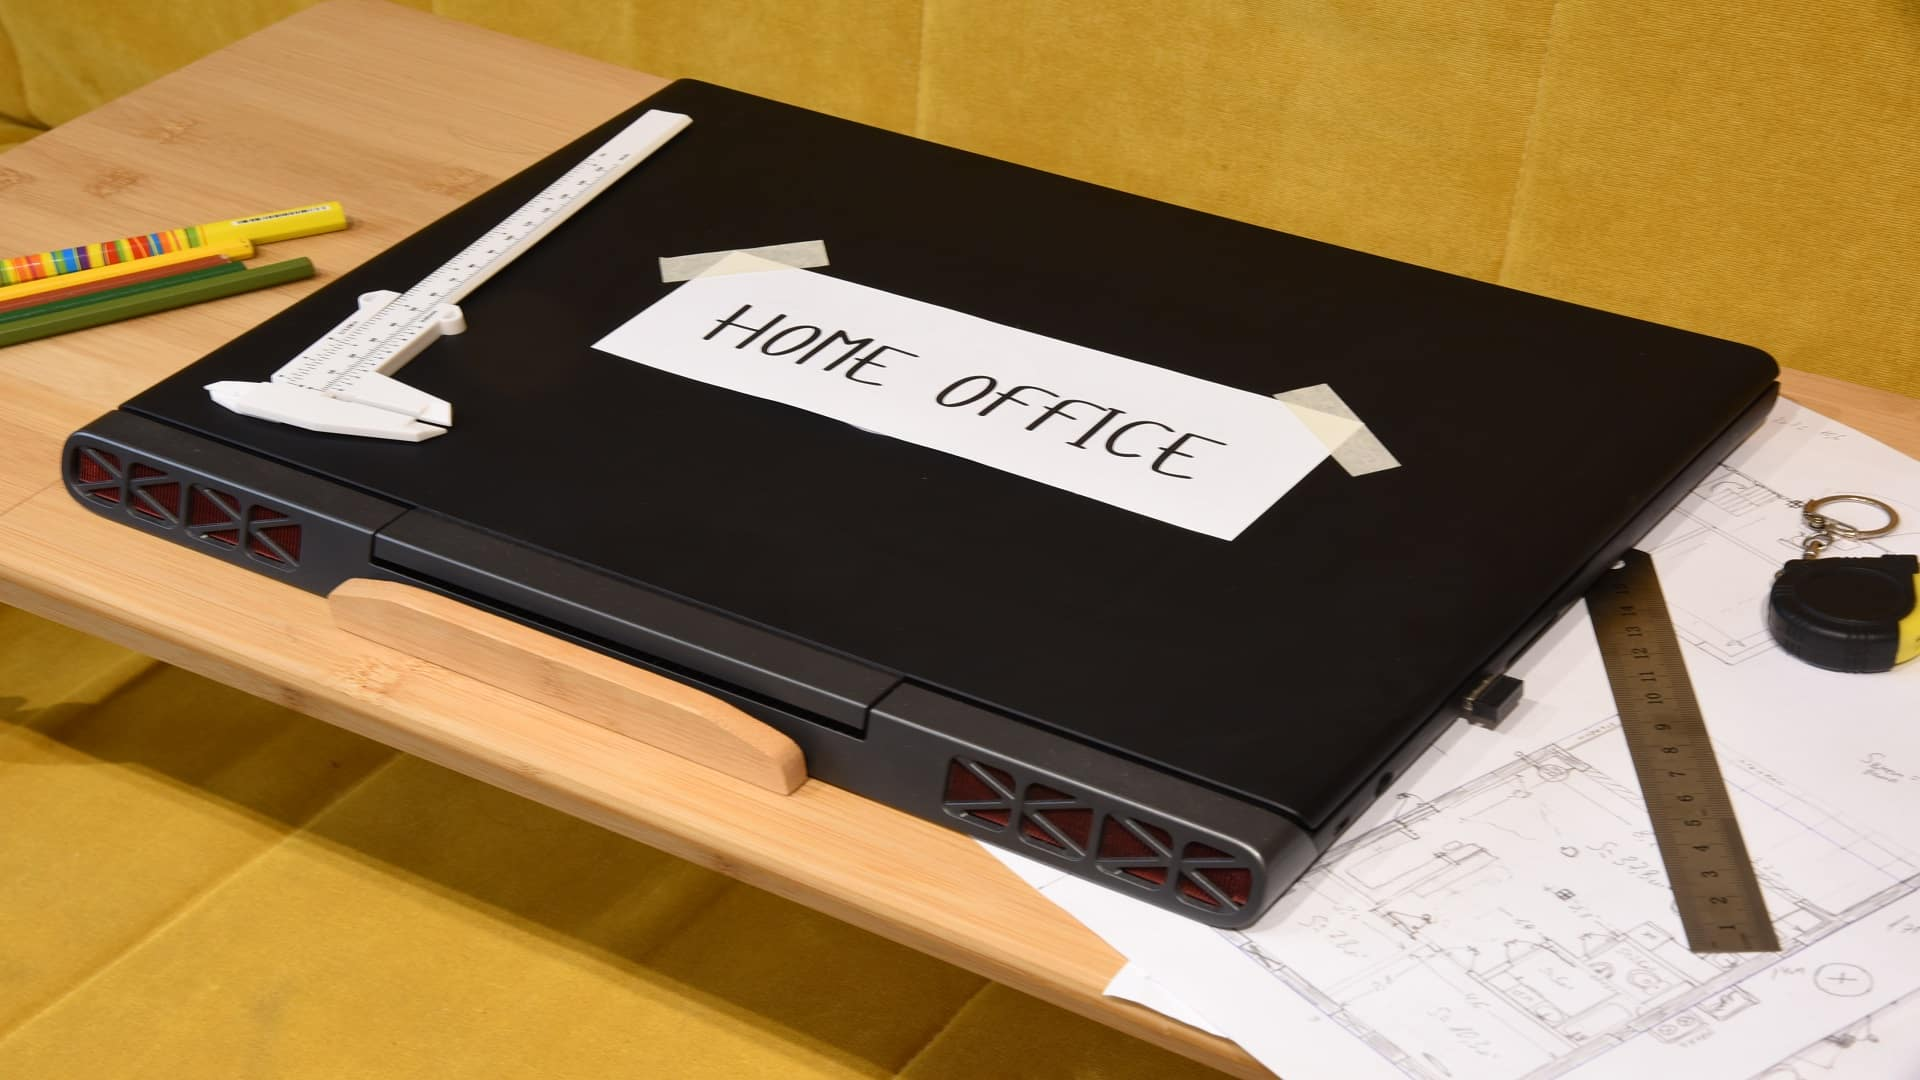 Ноутбук - пример электрооборудования класса III